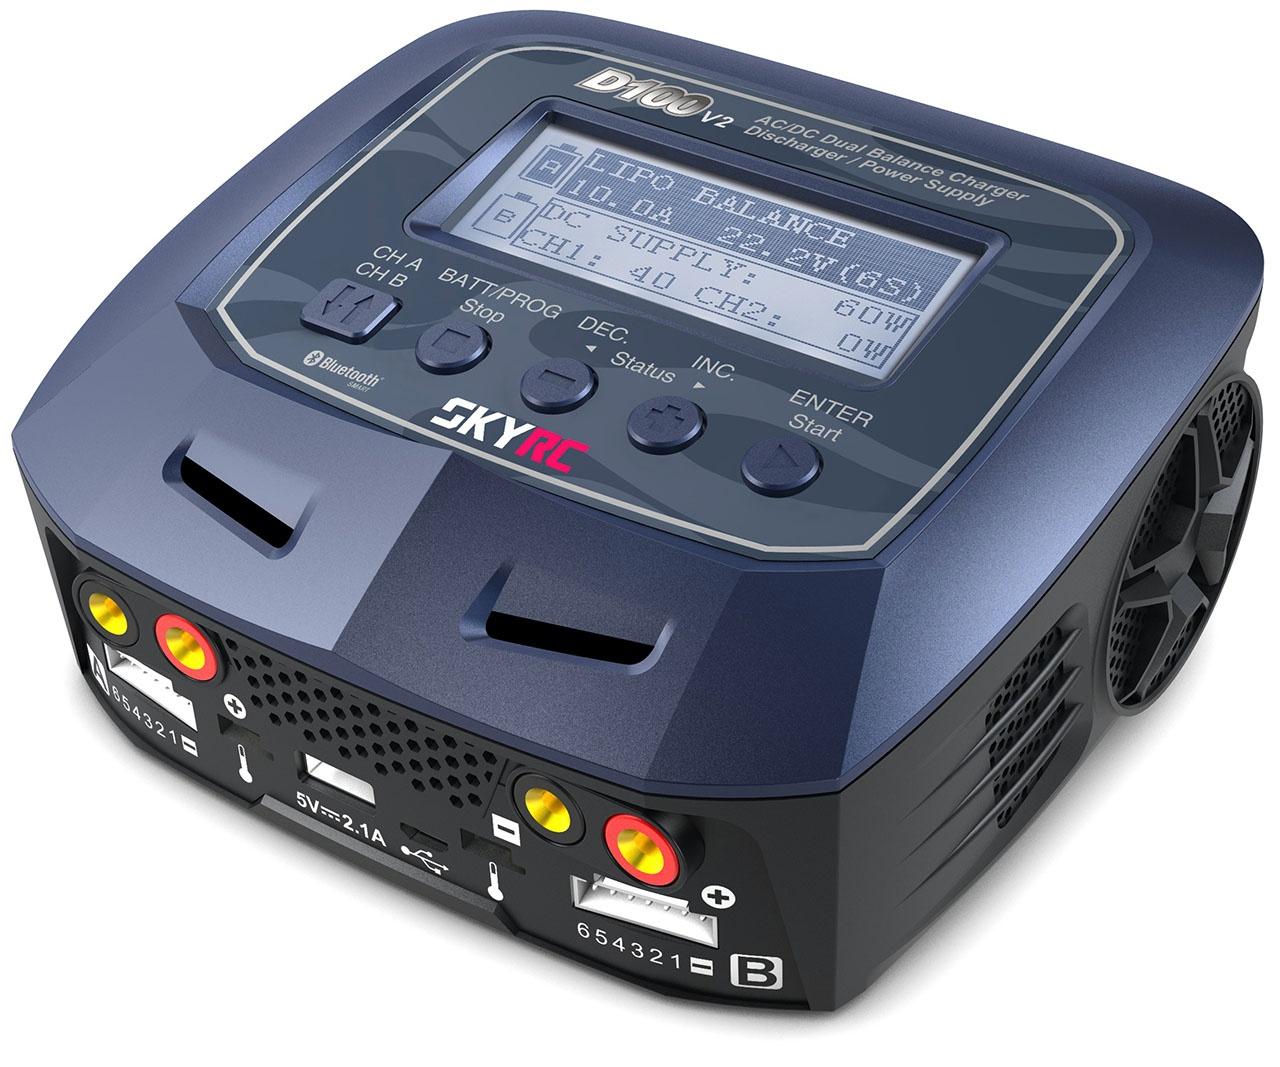 Ladegerät D100 AC/DC DUO LiPo 1-6S 10A 100W